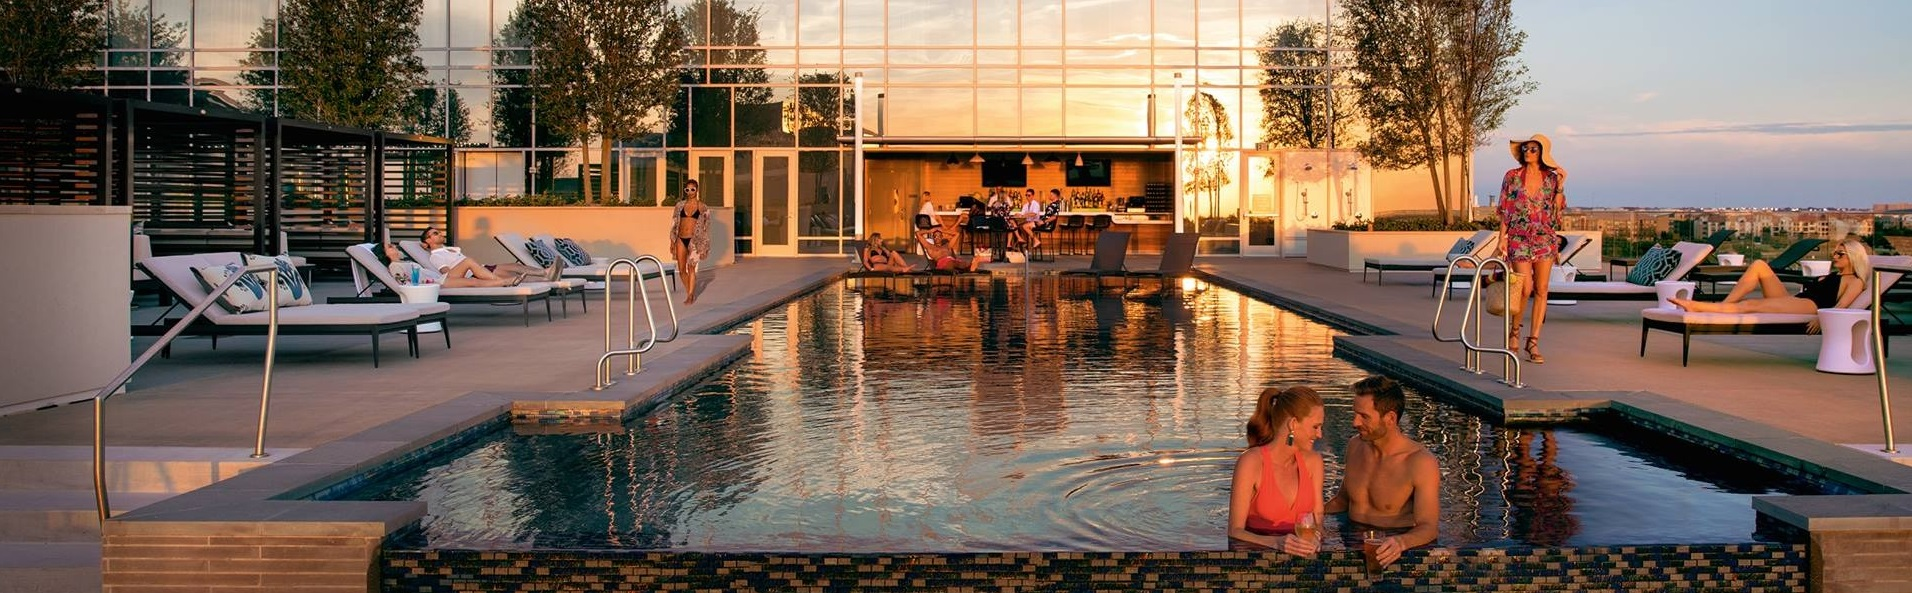 frisco-pool